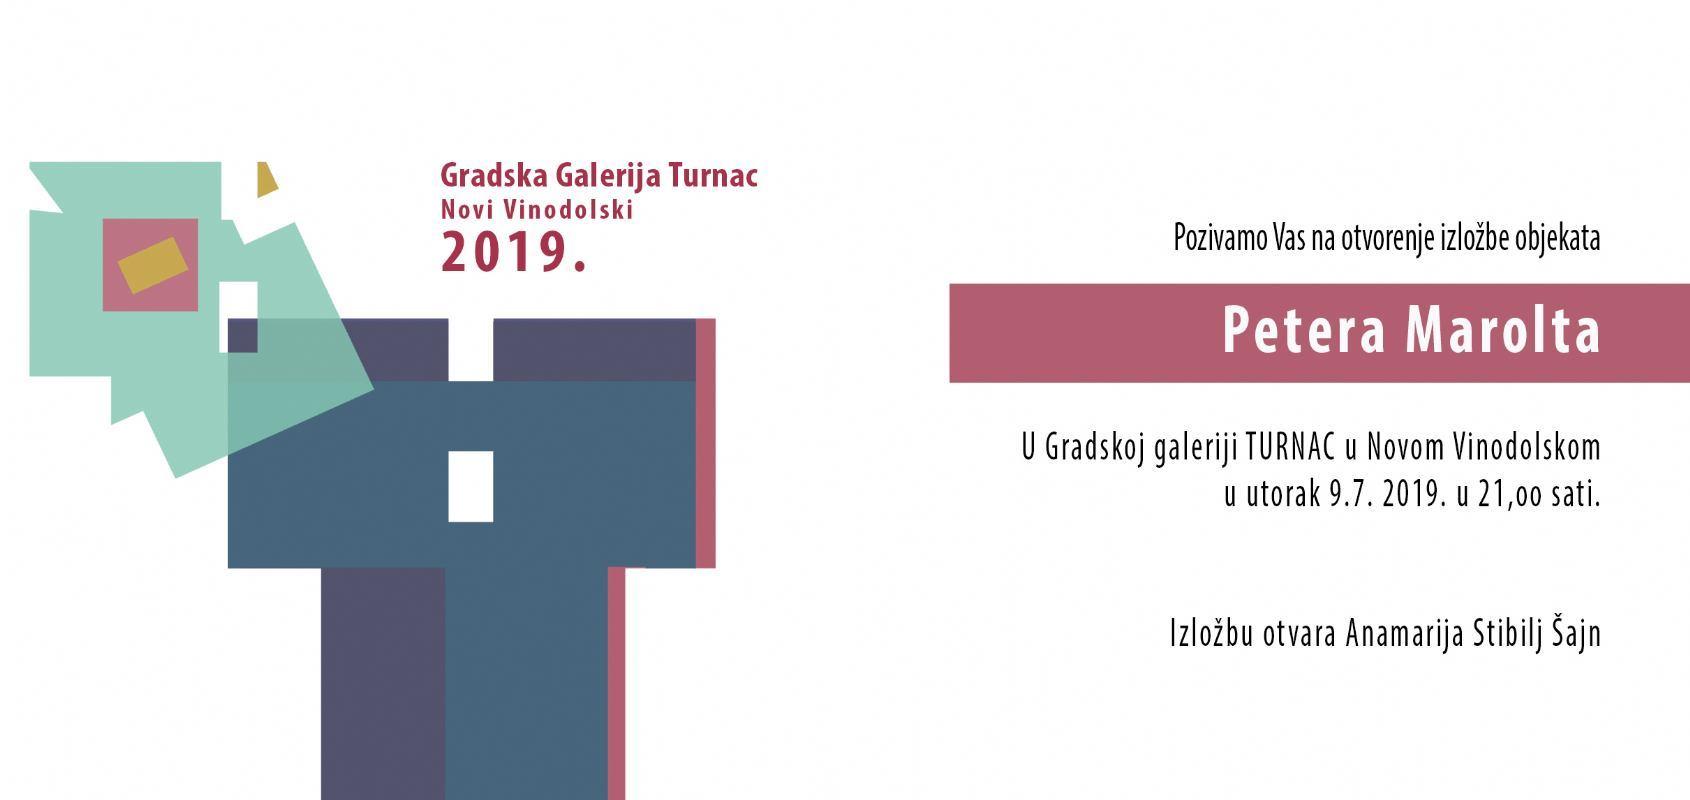 Izložbeni program Gradske galerije Turnac